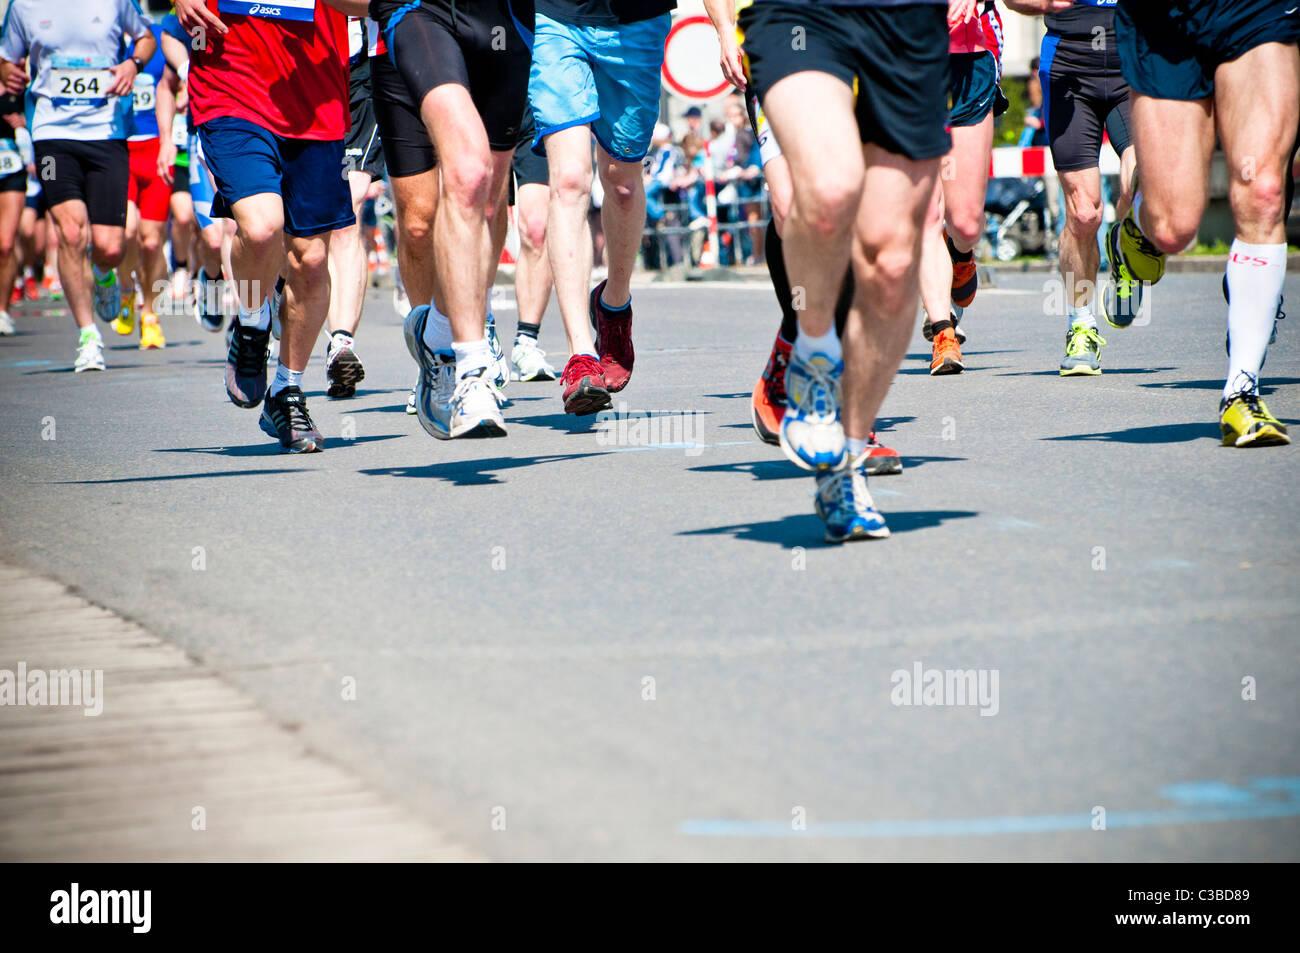 marathon runners legs - Stock Image